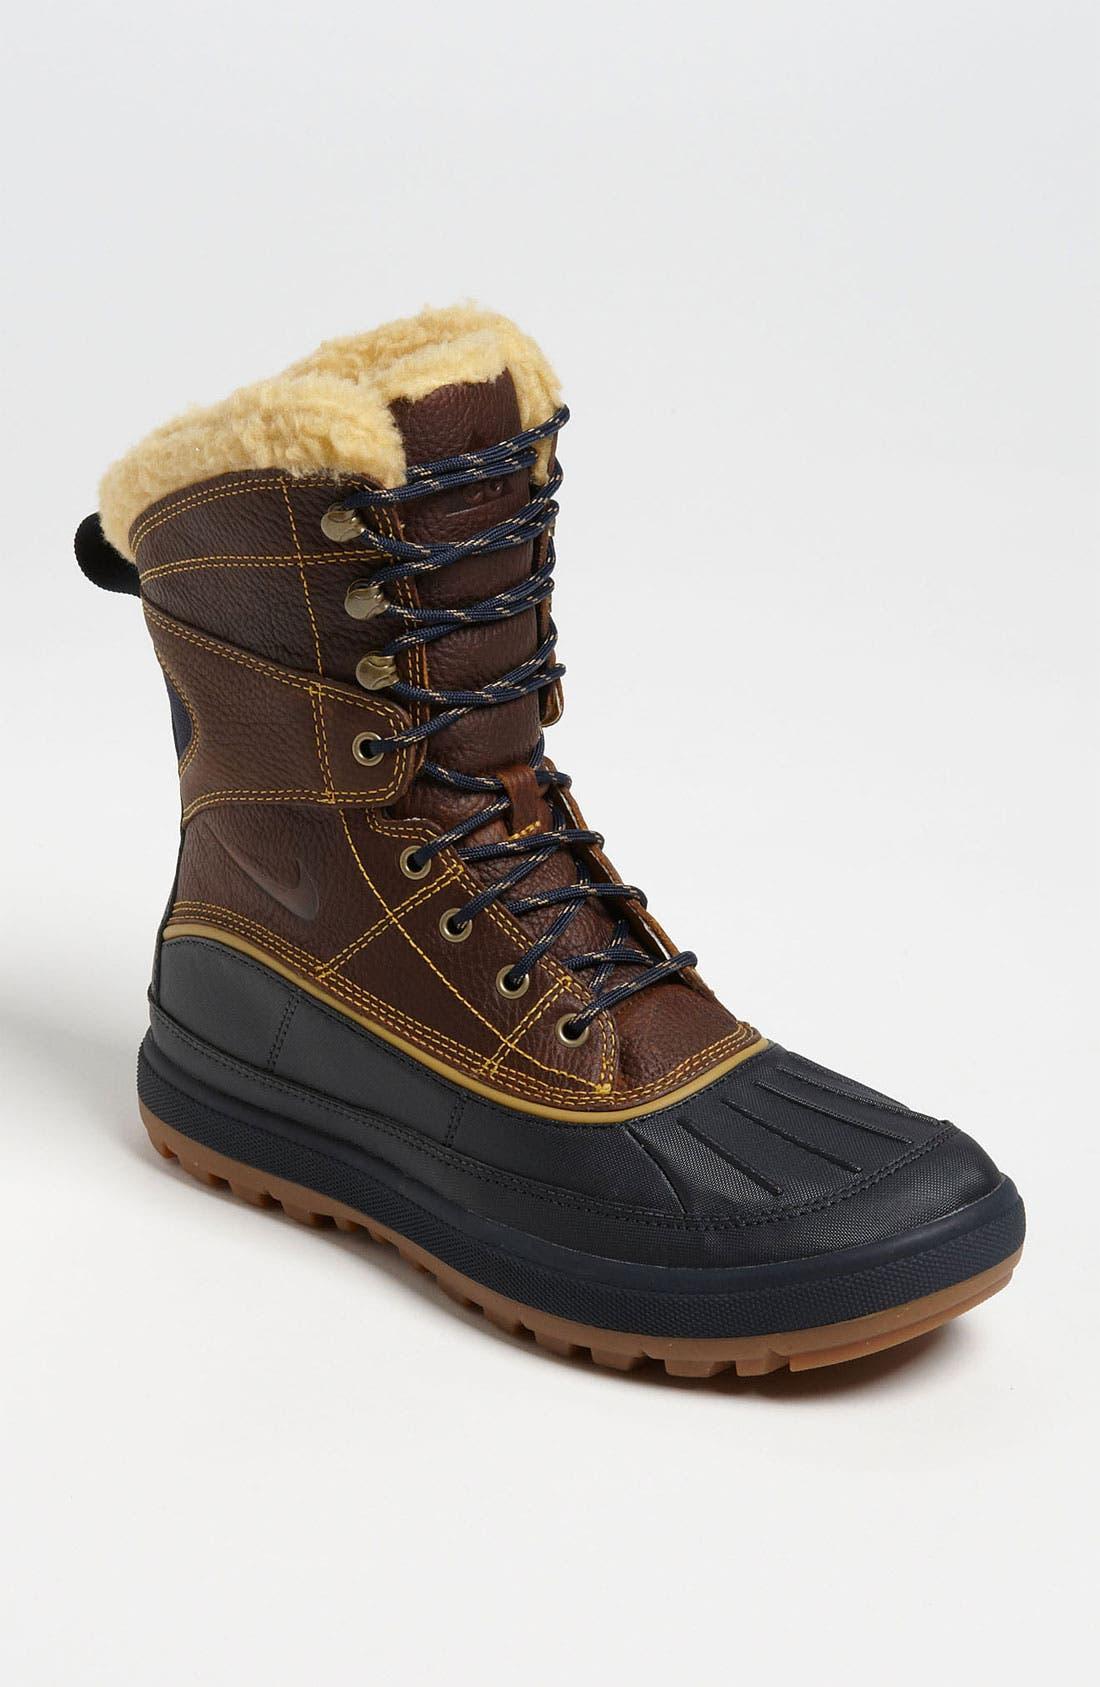 Alternate Image 1 Selected - Nike 'Woodside II' Snow Boot